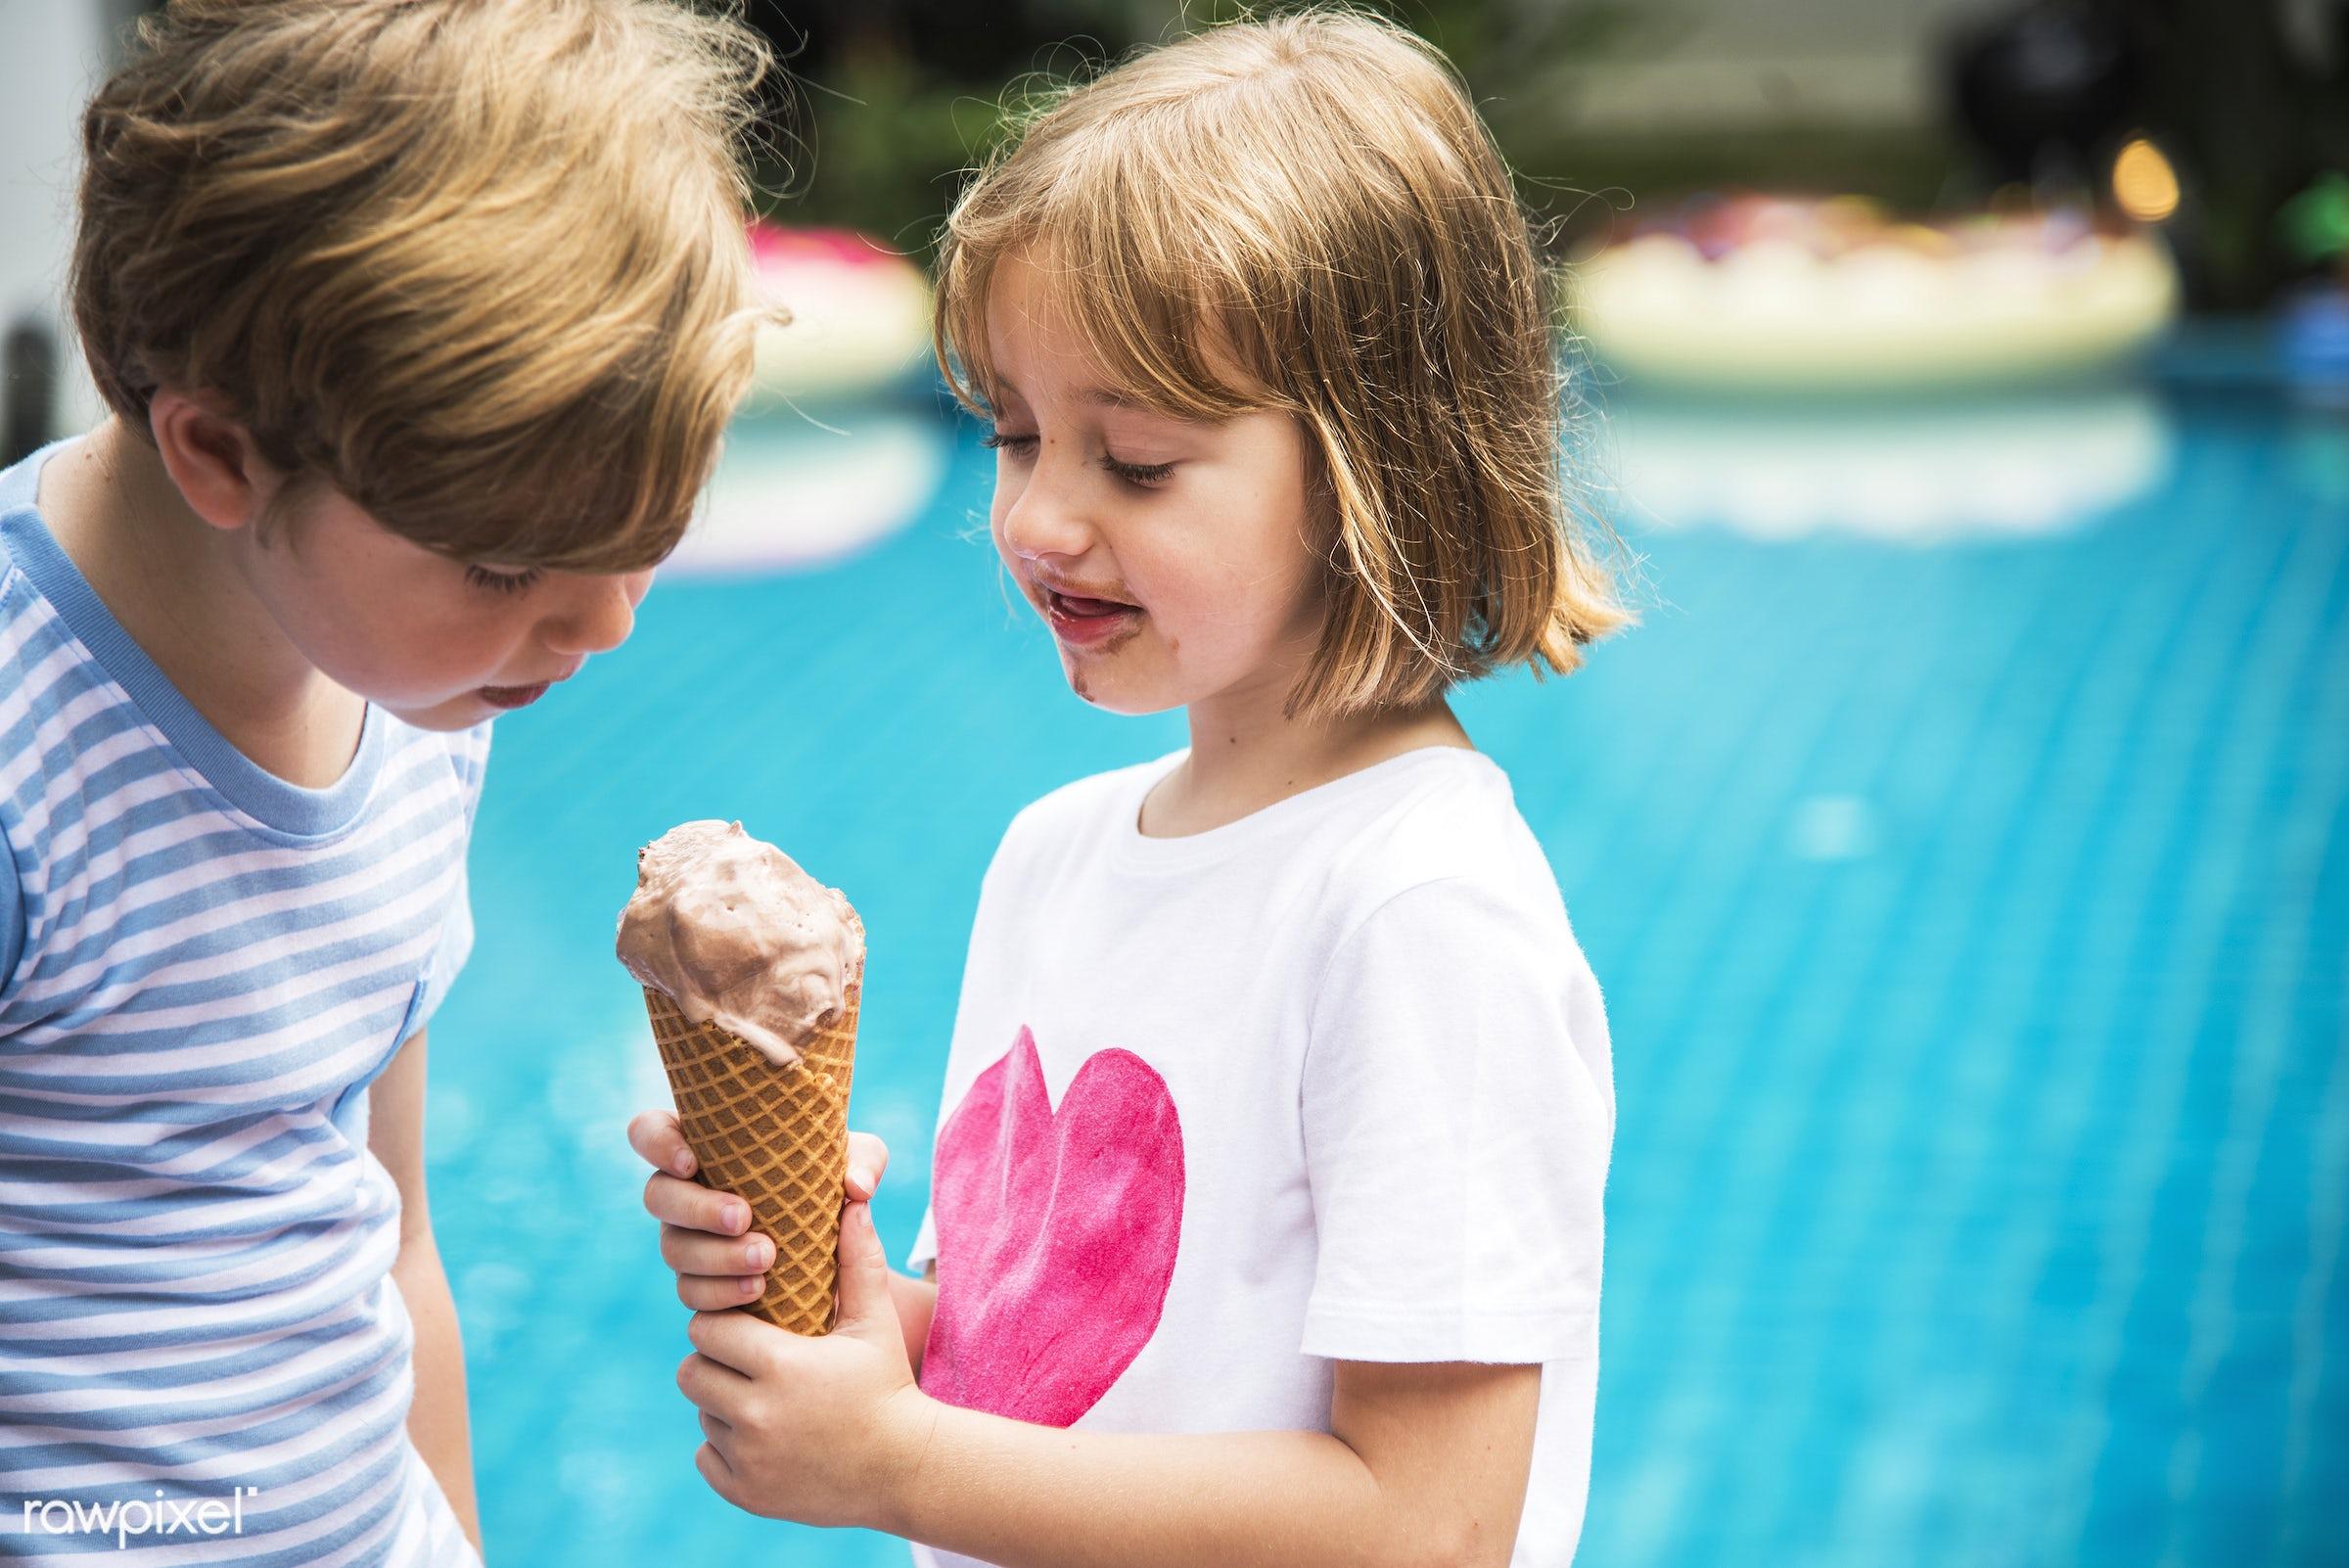 boy, brother, cheerful, child, closeup, eating, enjoying, fun, girl, holiday, ice cream, kid, leisure, outdoors, pool,...